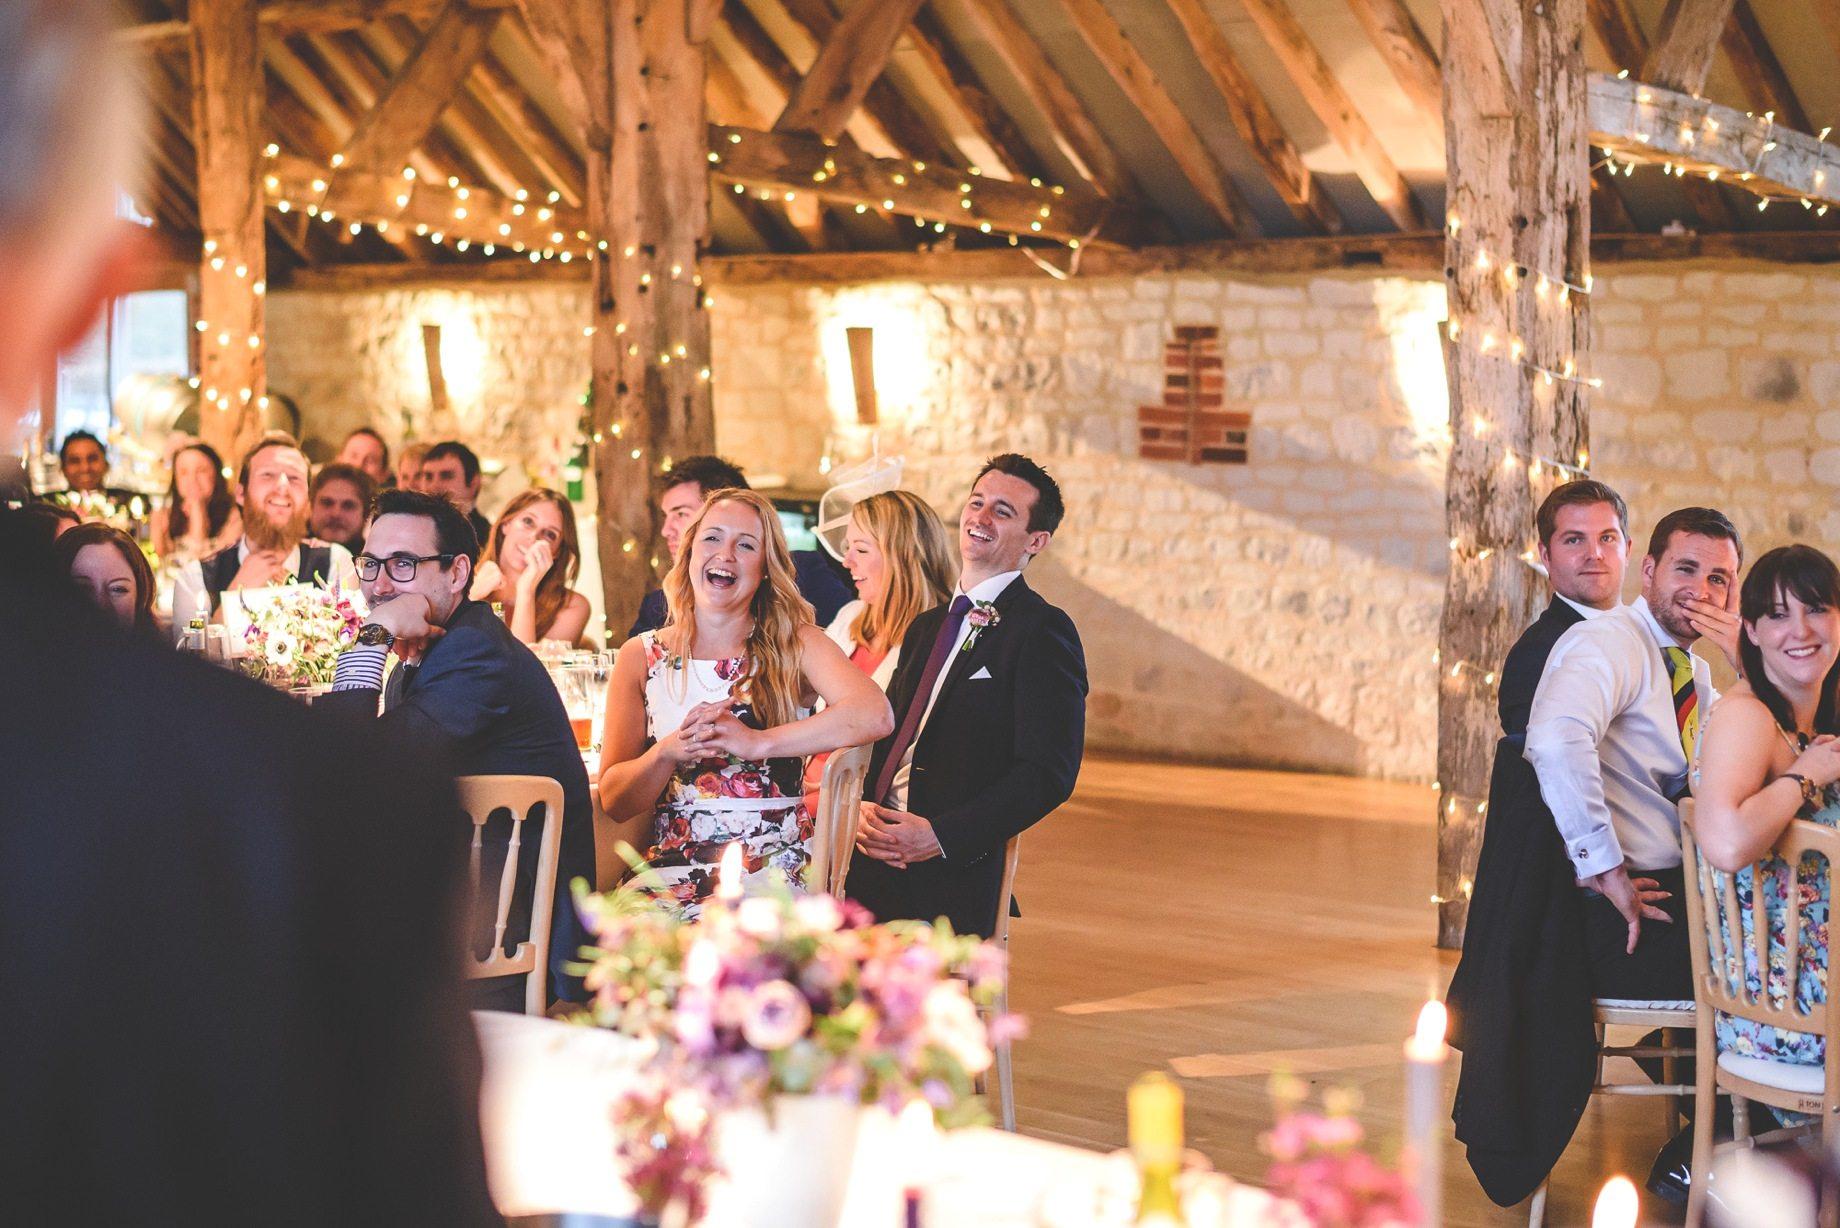 Heather and Chris - Hampshire wedding photography (139 of 174)